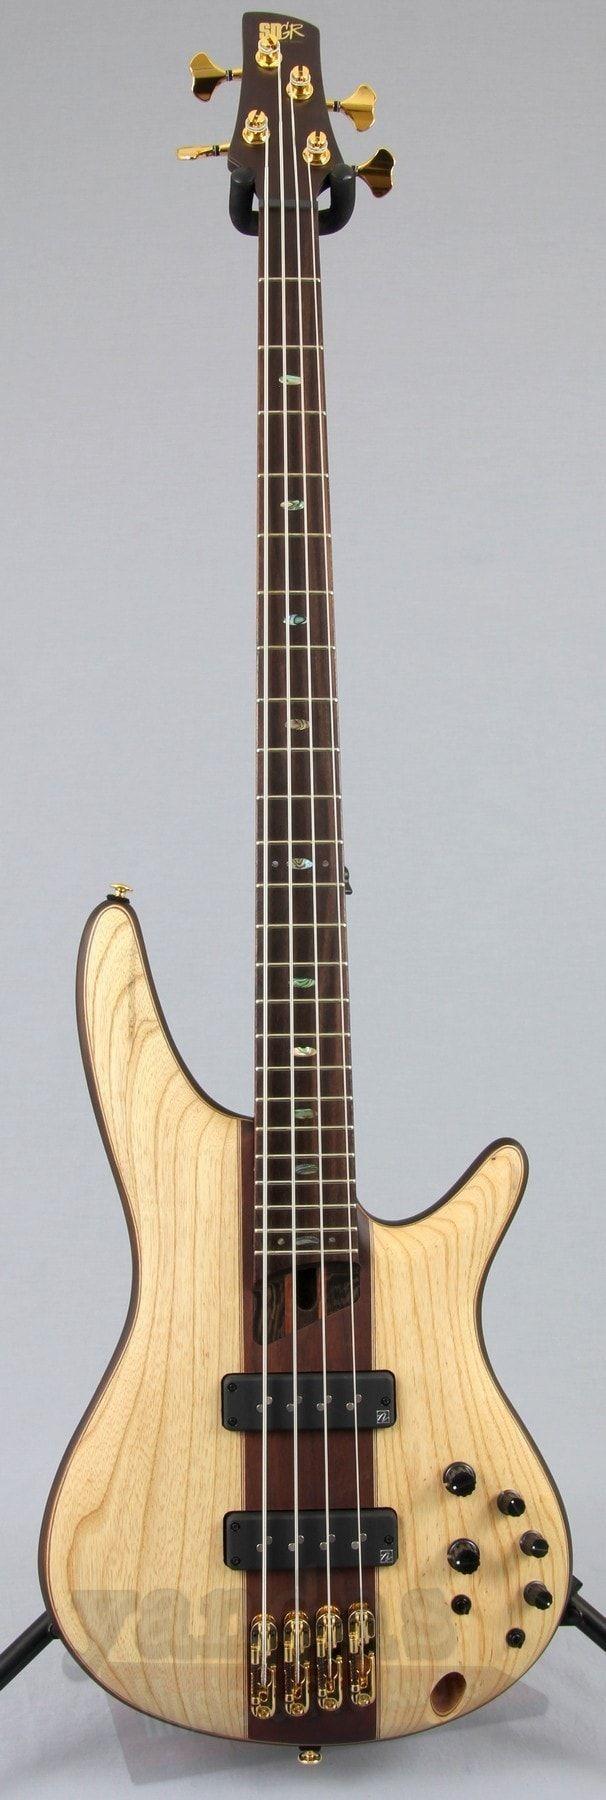 Ibanez SR1300E Premium Series Bass Guitar